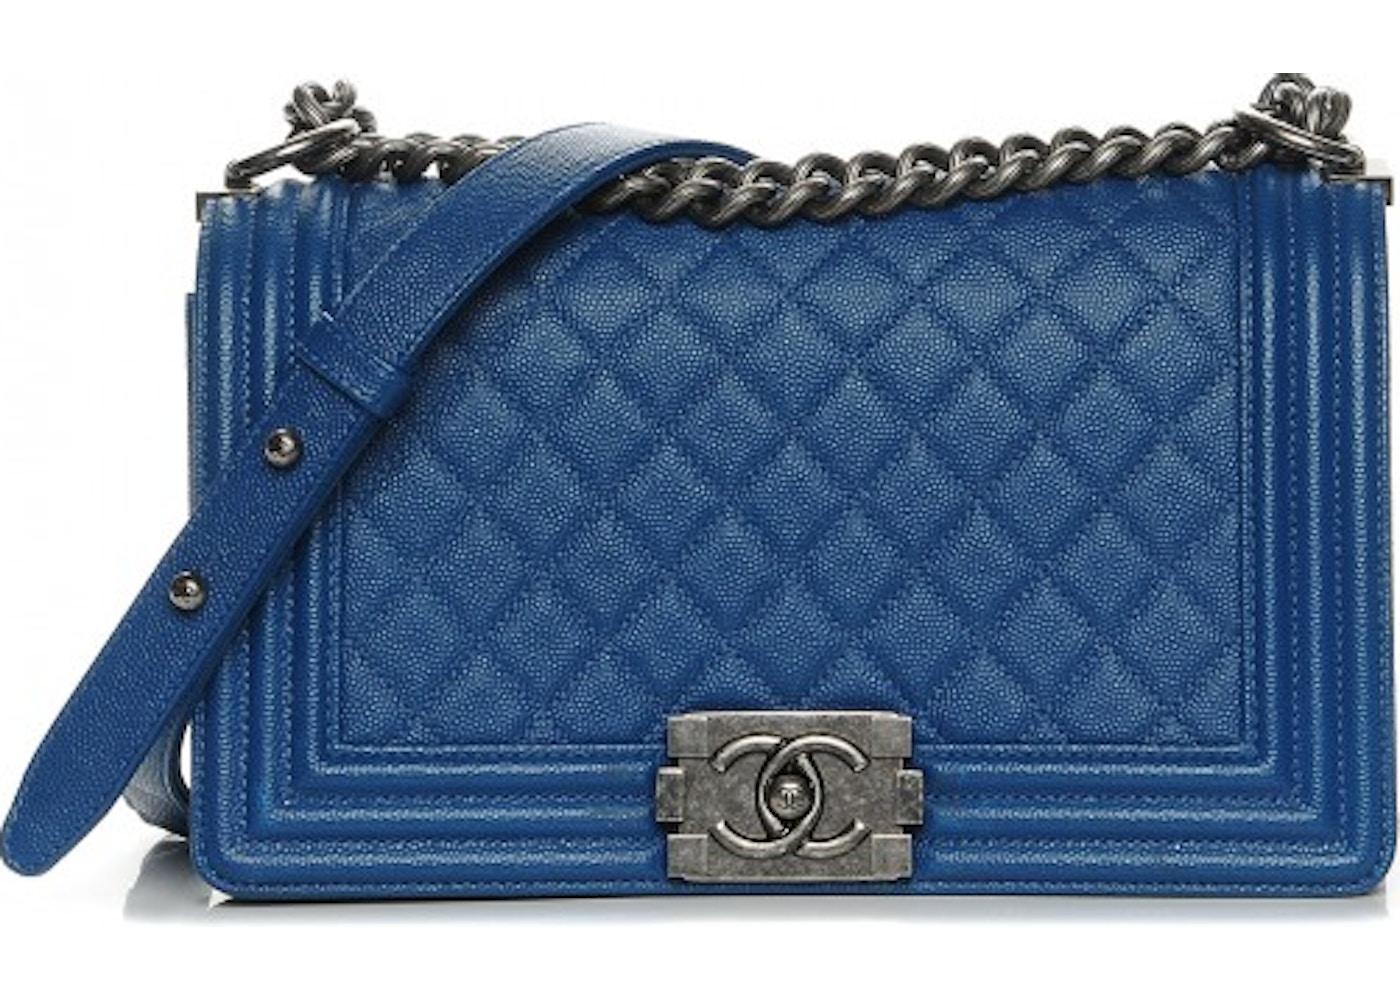 f83c3de116d5 Chanel Boy Flap Diamond Quilted Medium Dark Blue